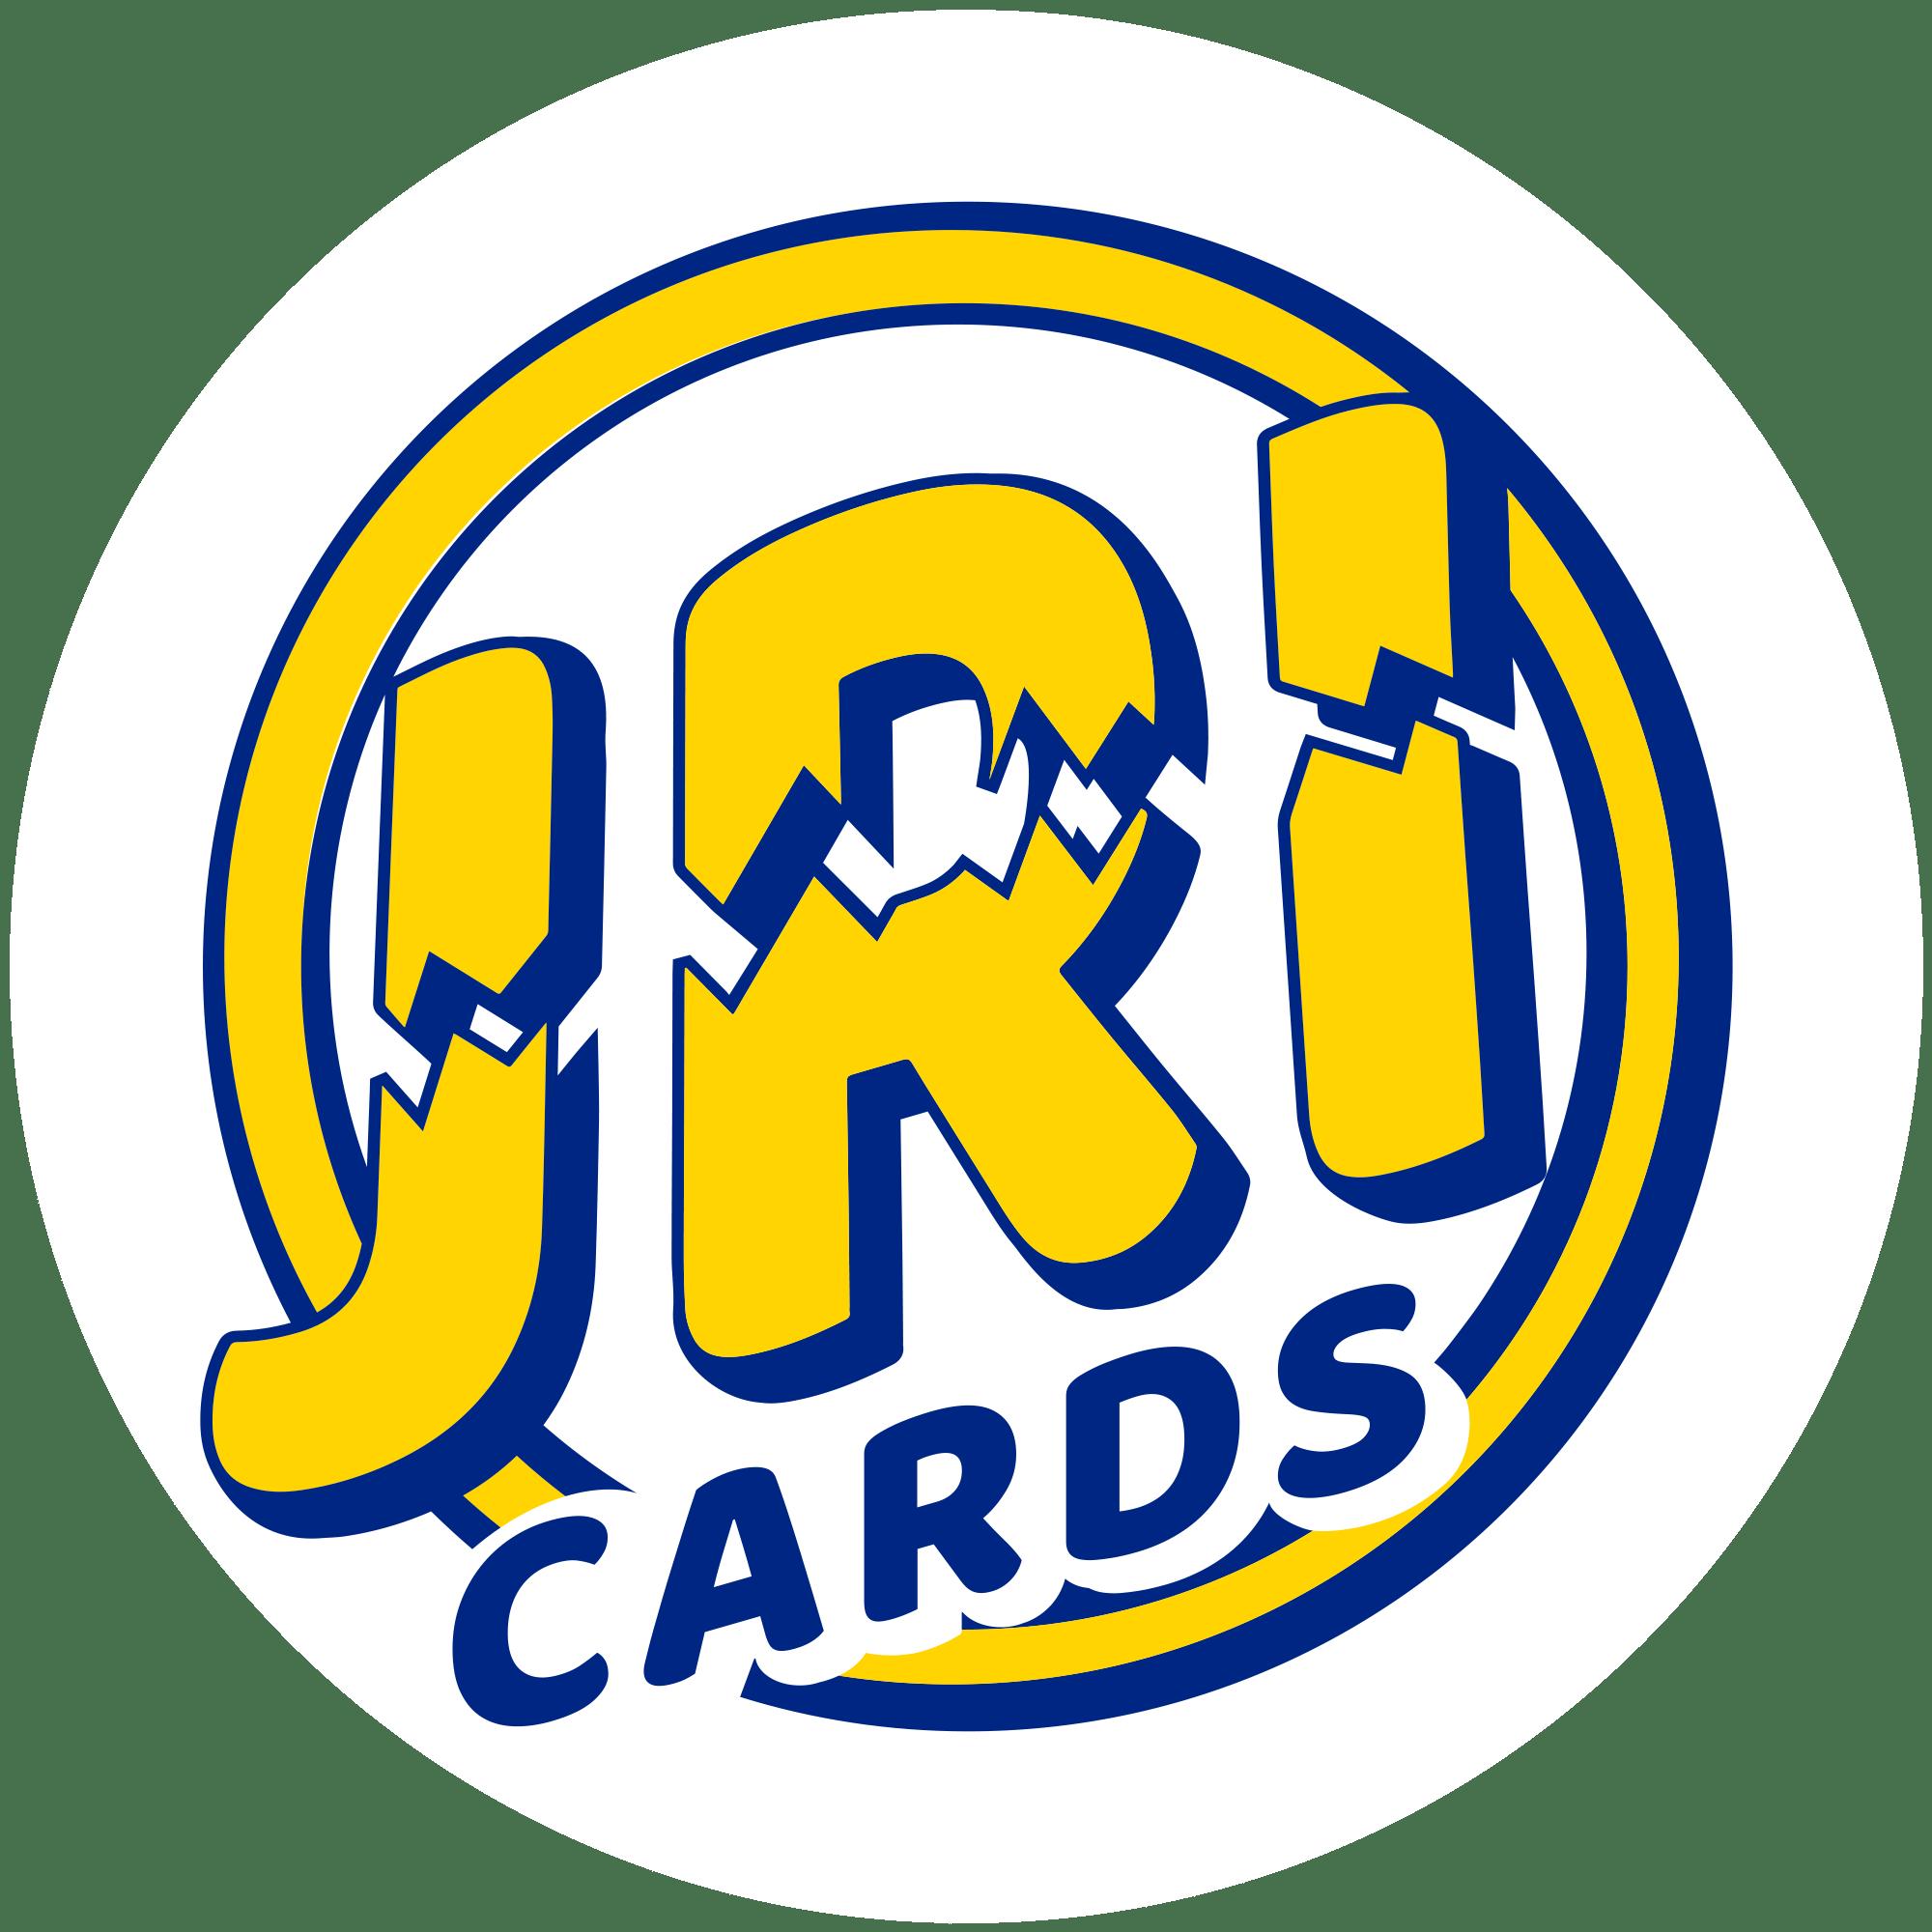 2017 PANINI CERTIFIED FOOTBALL HOBBY BOX (10 PACKS AVAILABLE)